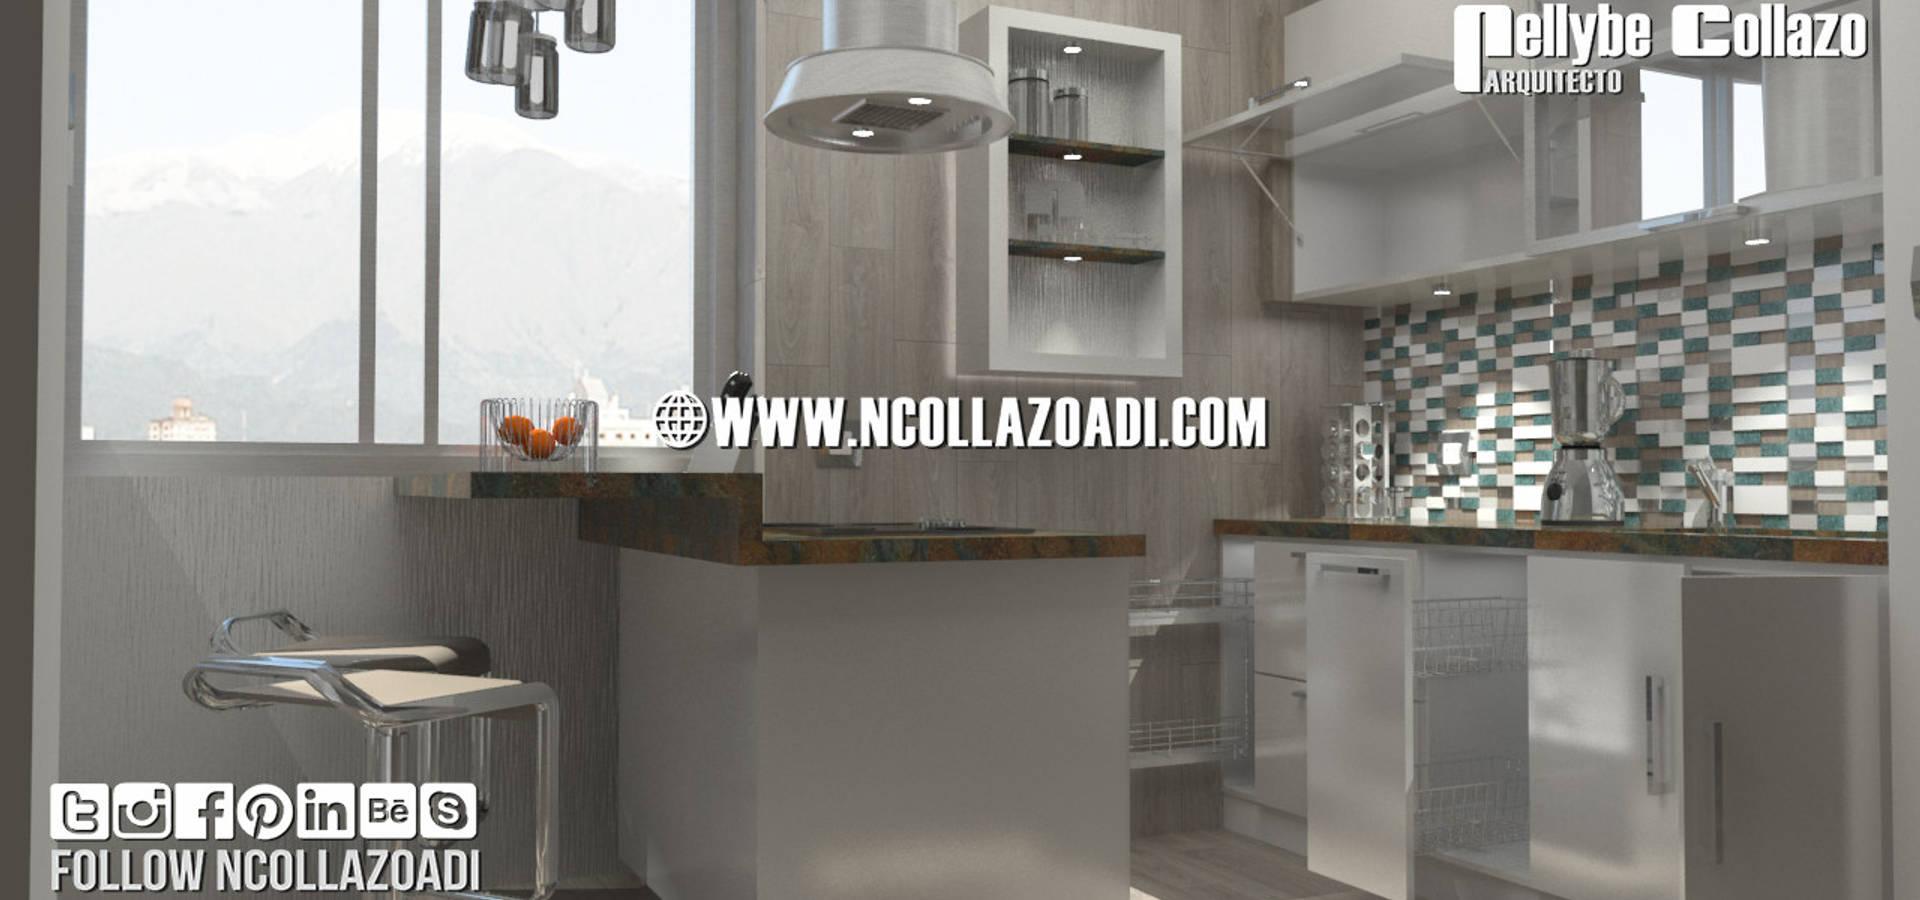 NCollazoADI